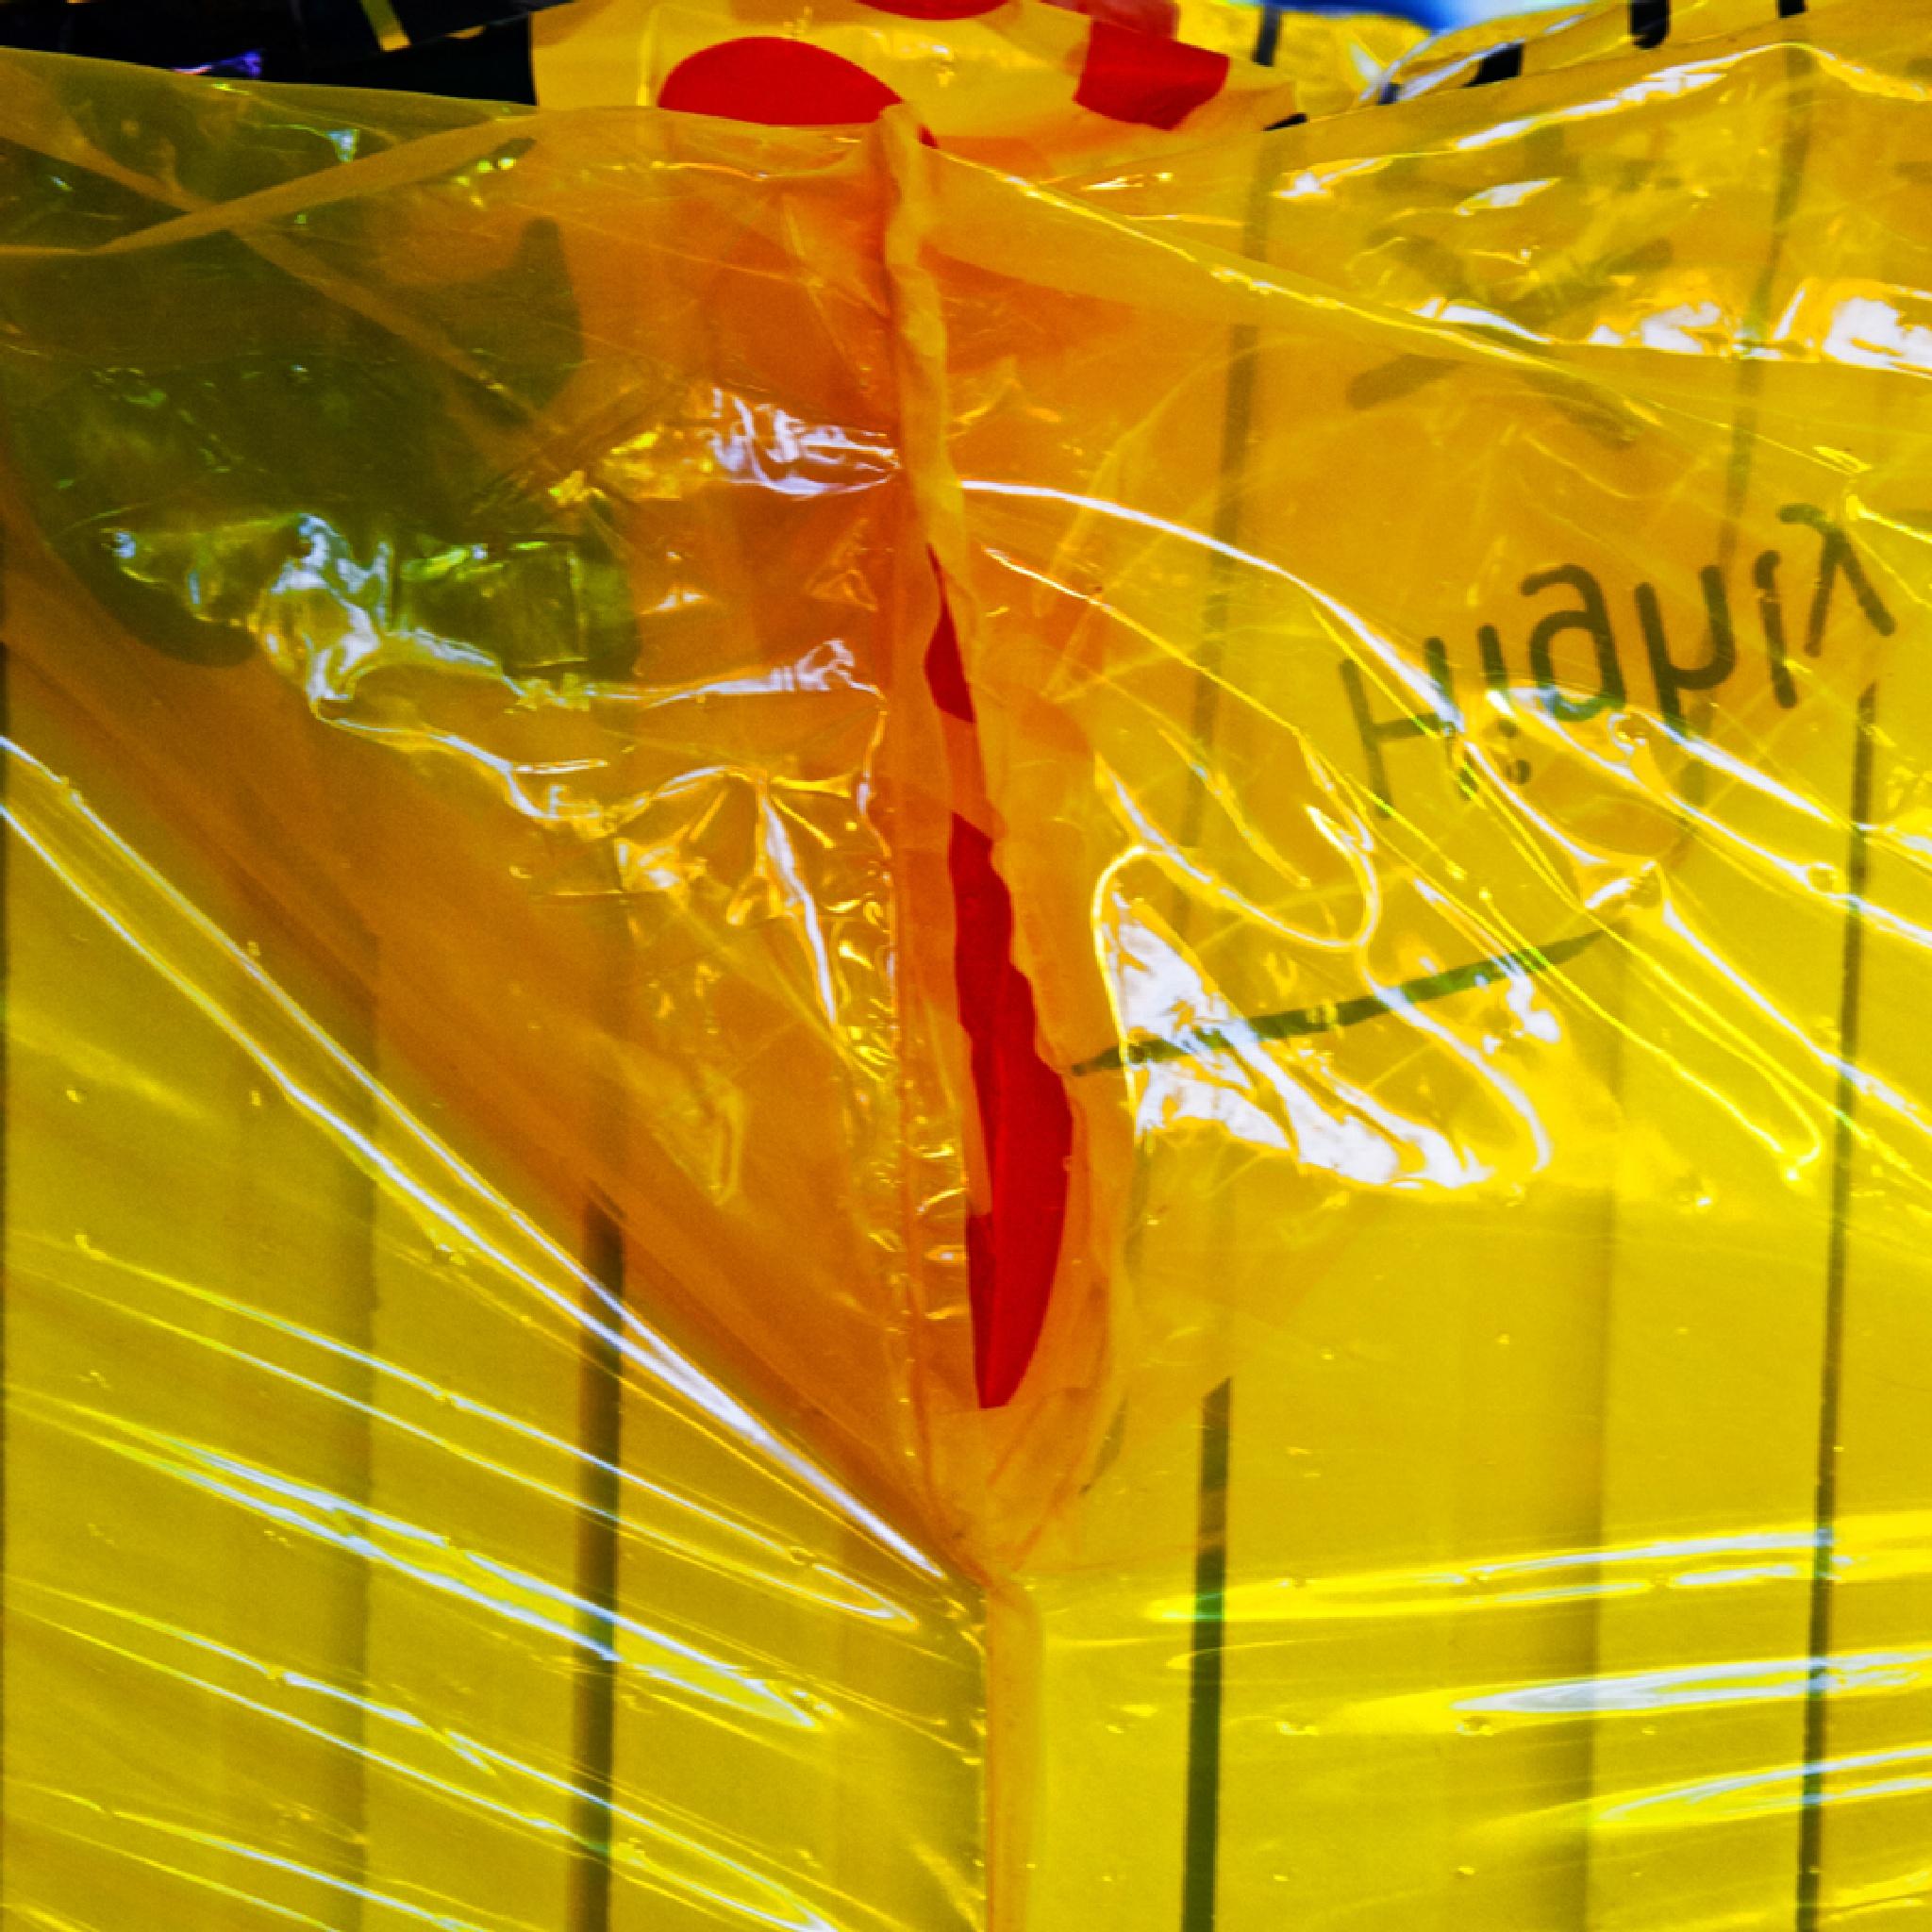 Mellow Yellow by christian.nesler1